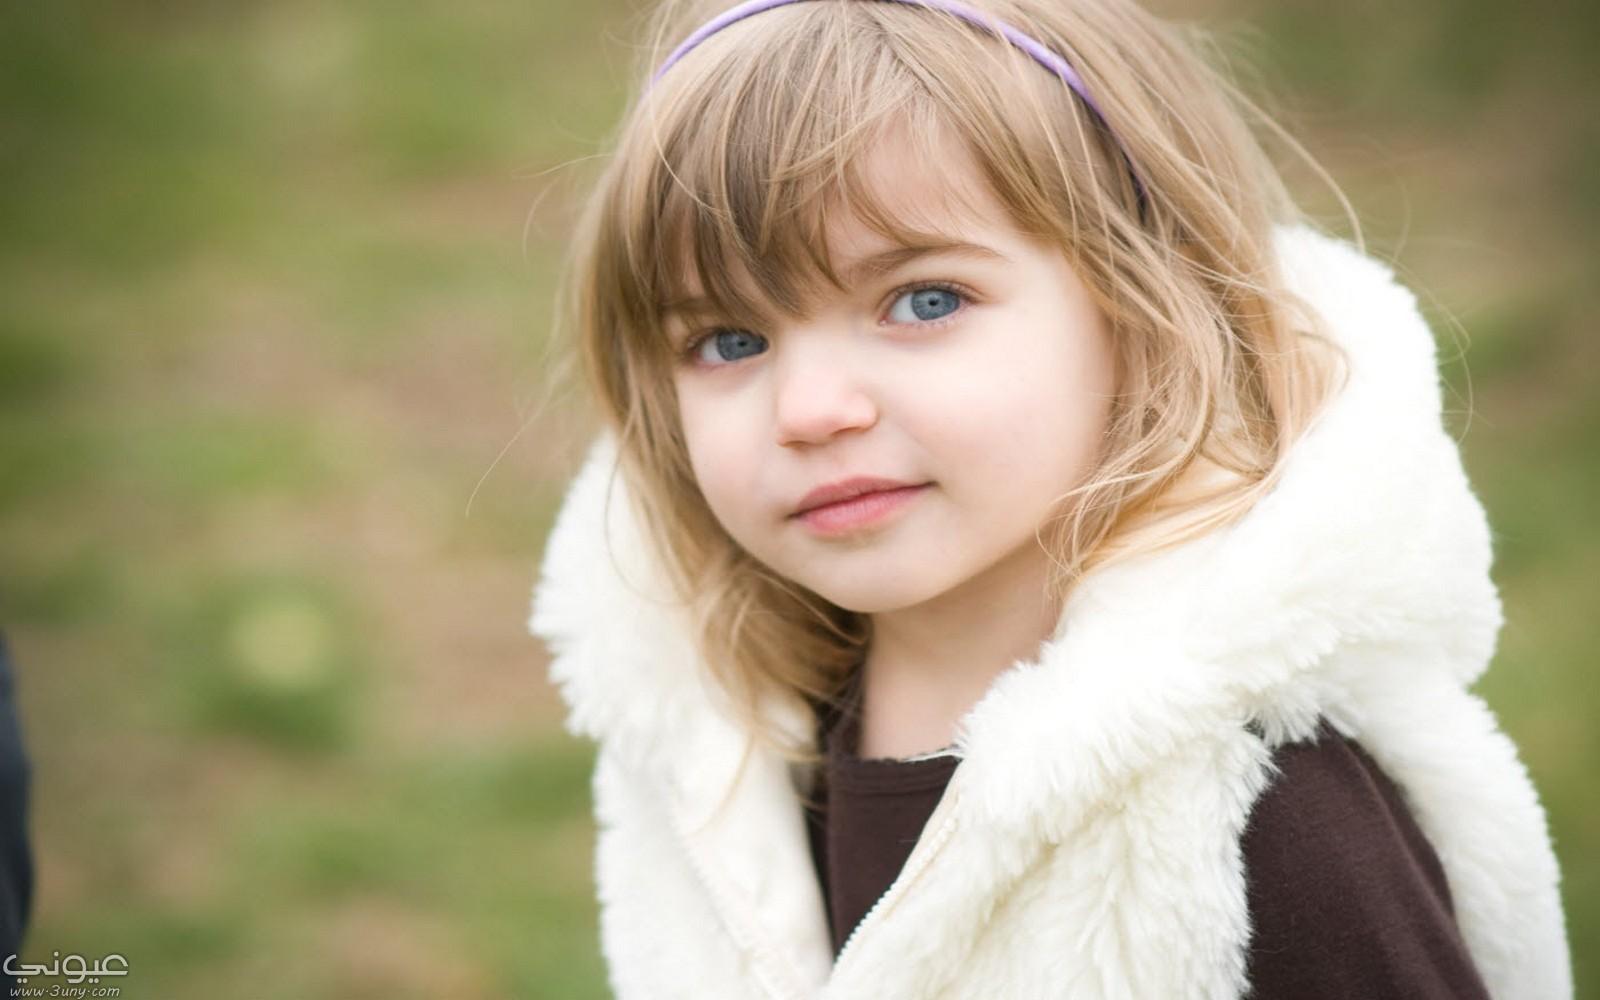 خلفيات اطفال بنات صغار كيوت للفيس بوك Makusia Images